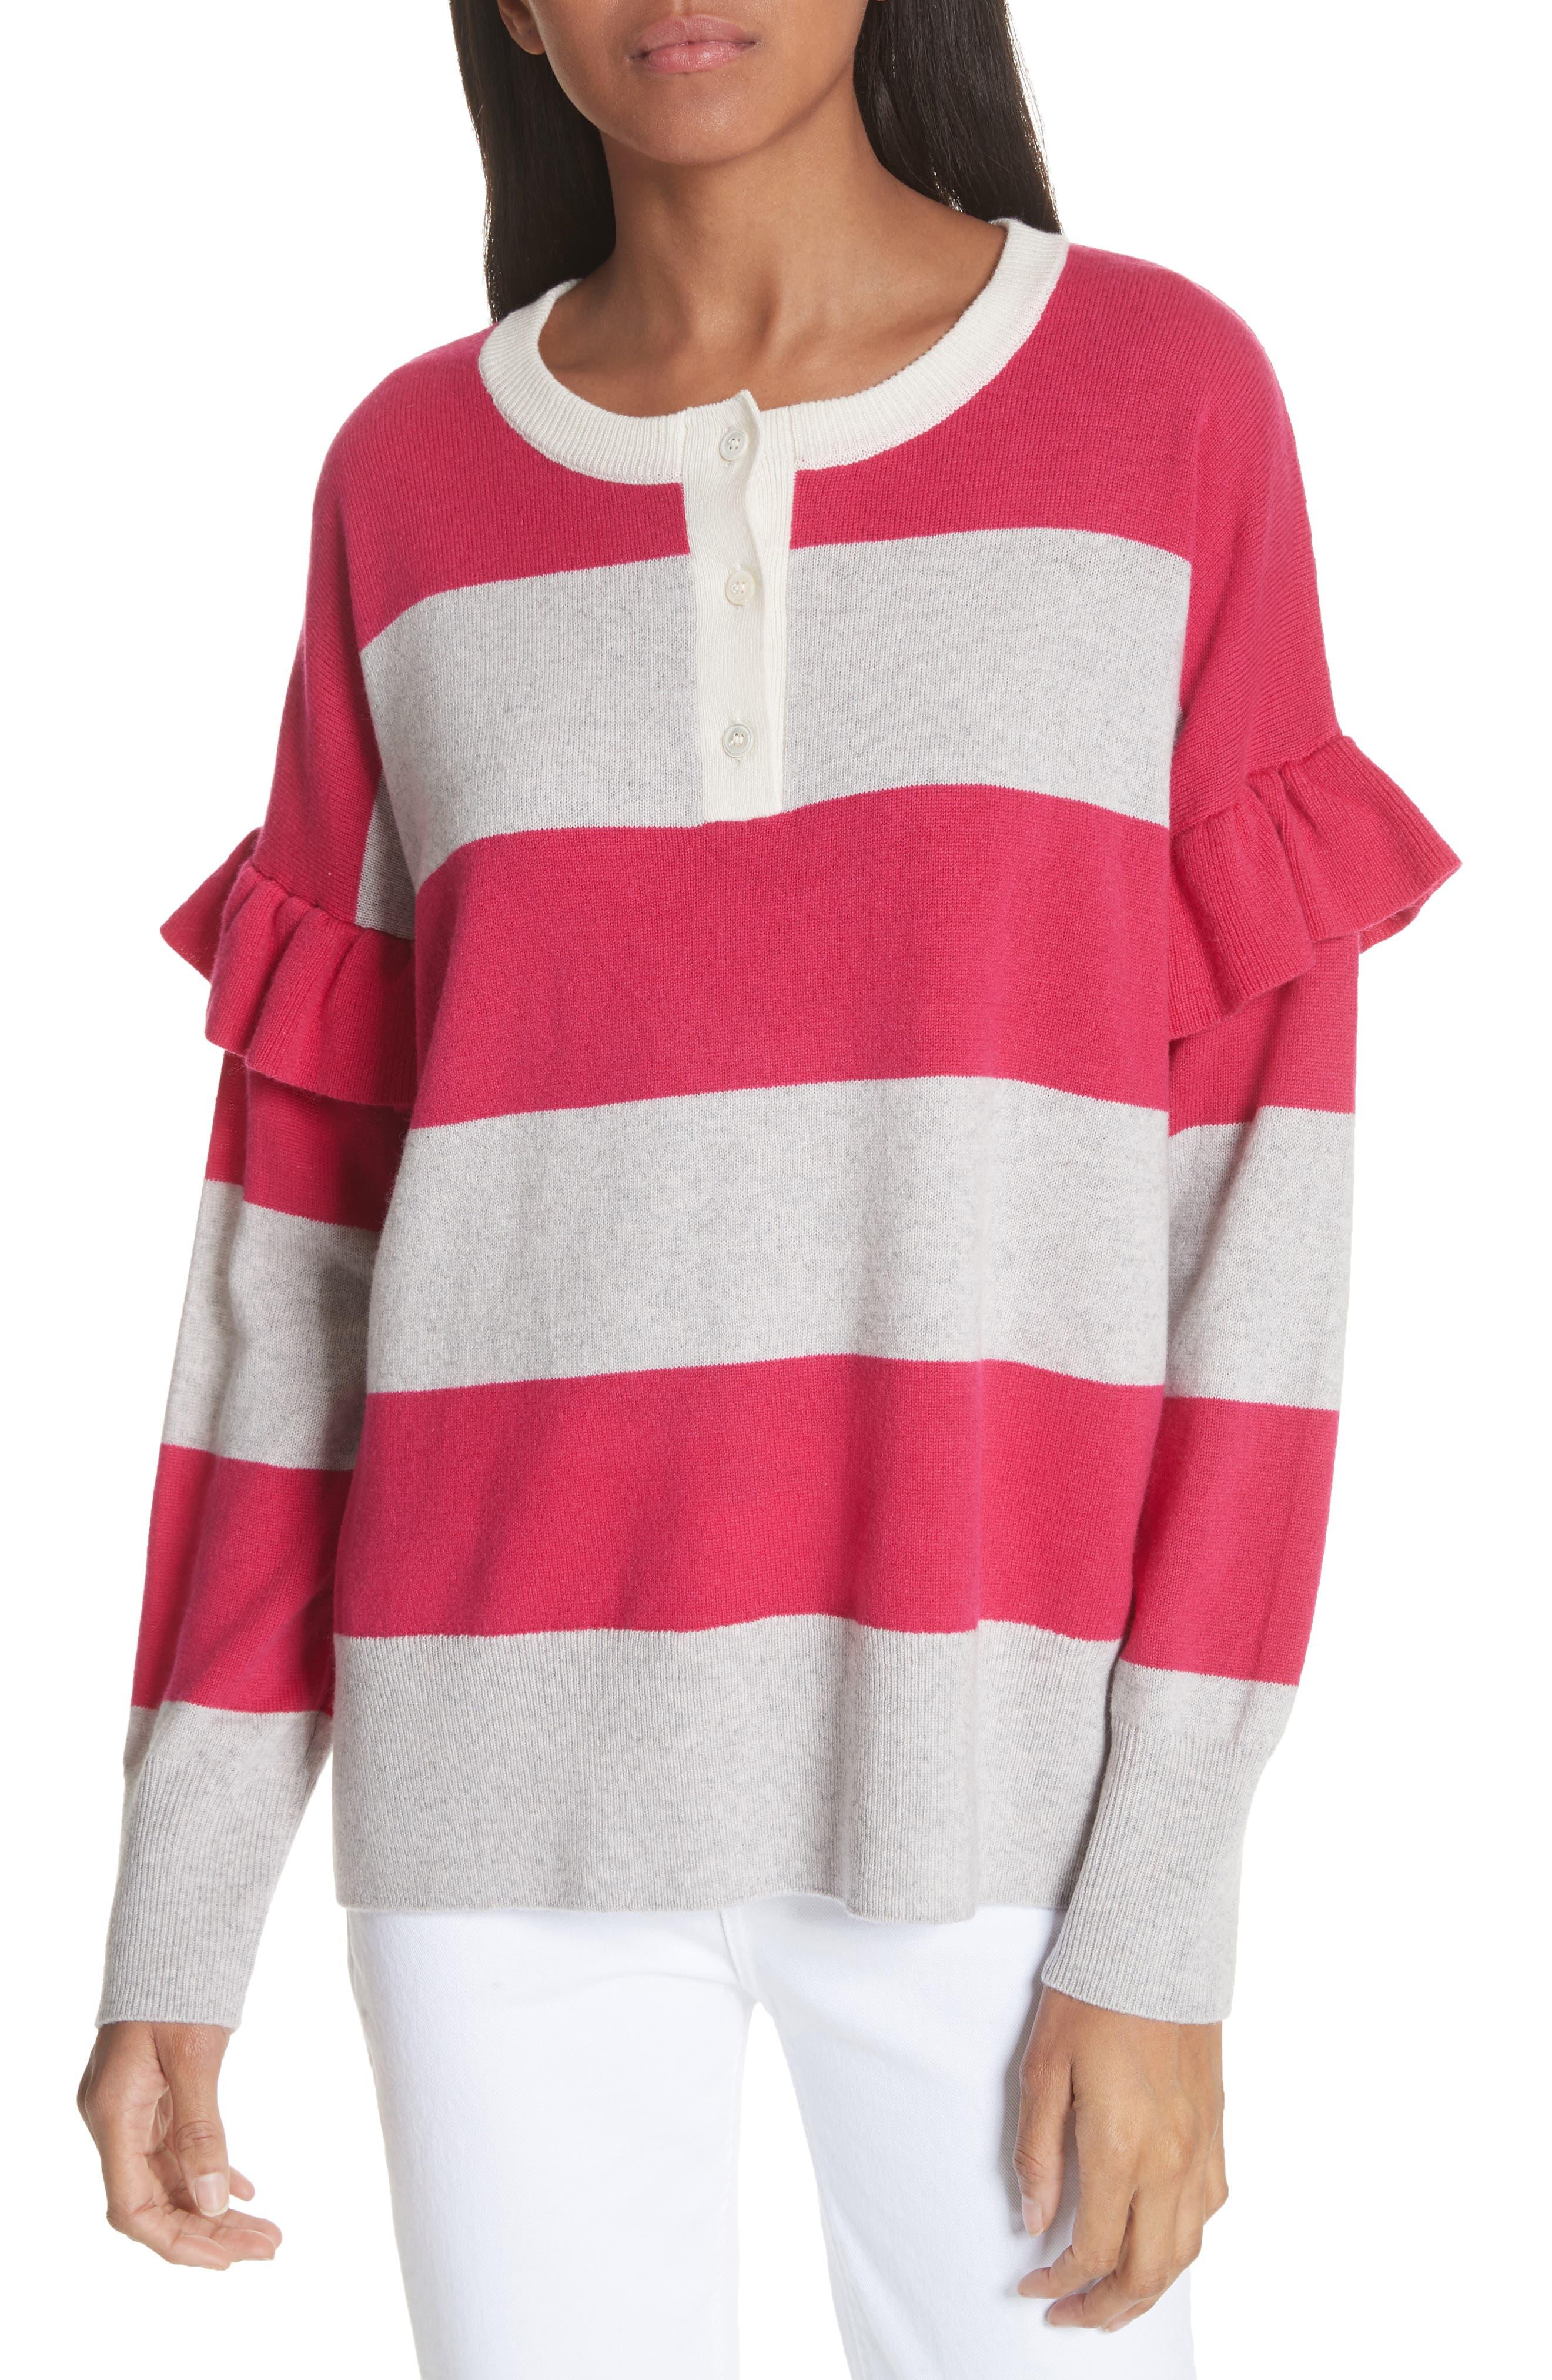 Inghin Stripe Wool & Cashmere Sweater,                         Main,                         color, Hacienda/ Heather Grey